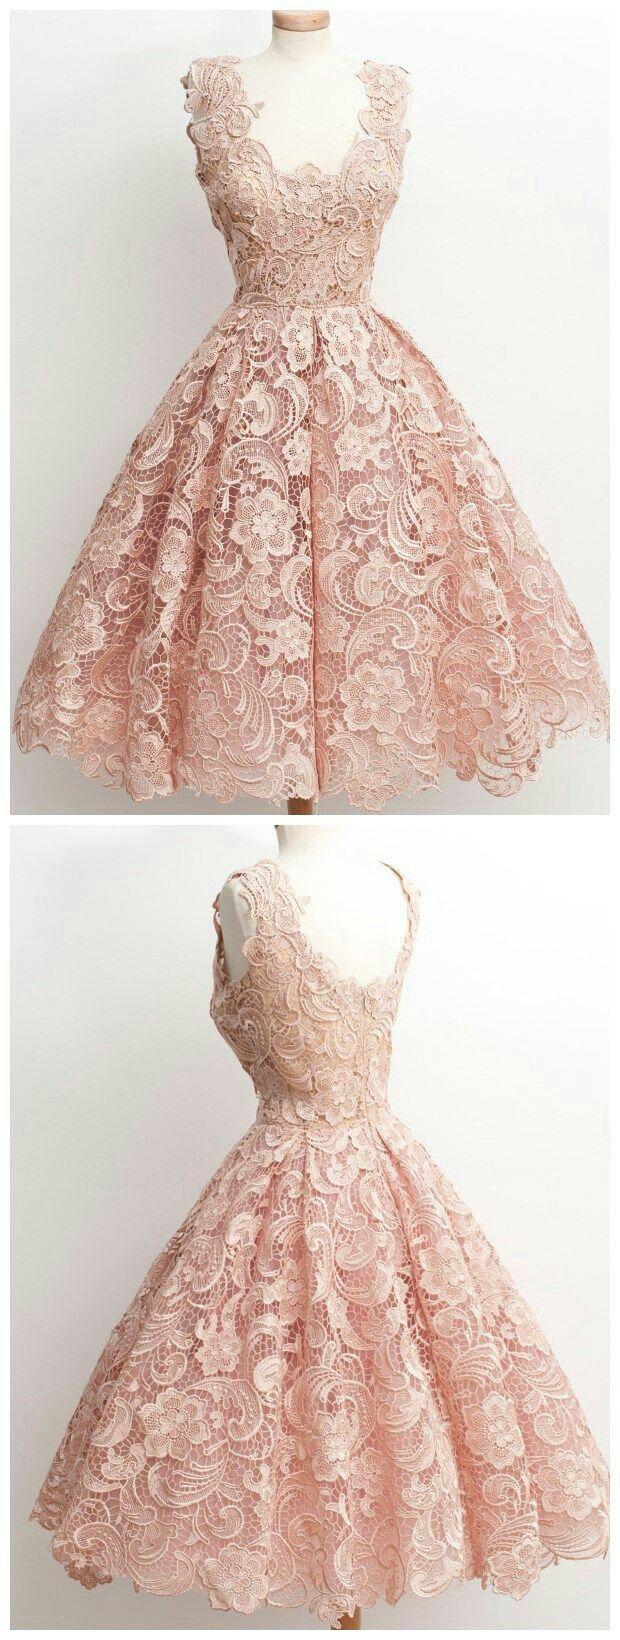 Lace dress with shorts underneath september 2019  best TLength Dresses images on Pinterest  Vintage dresses